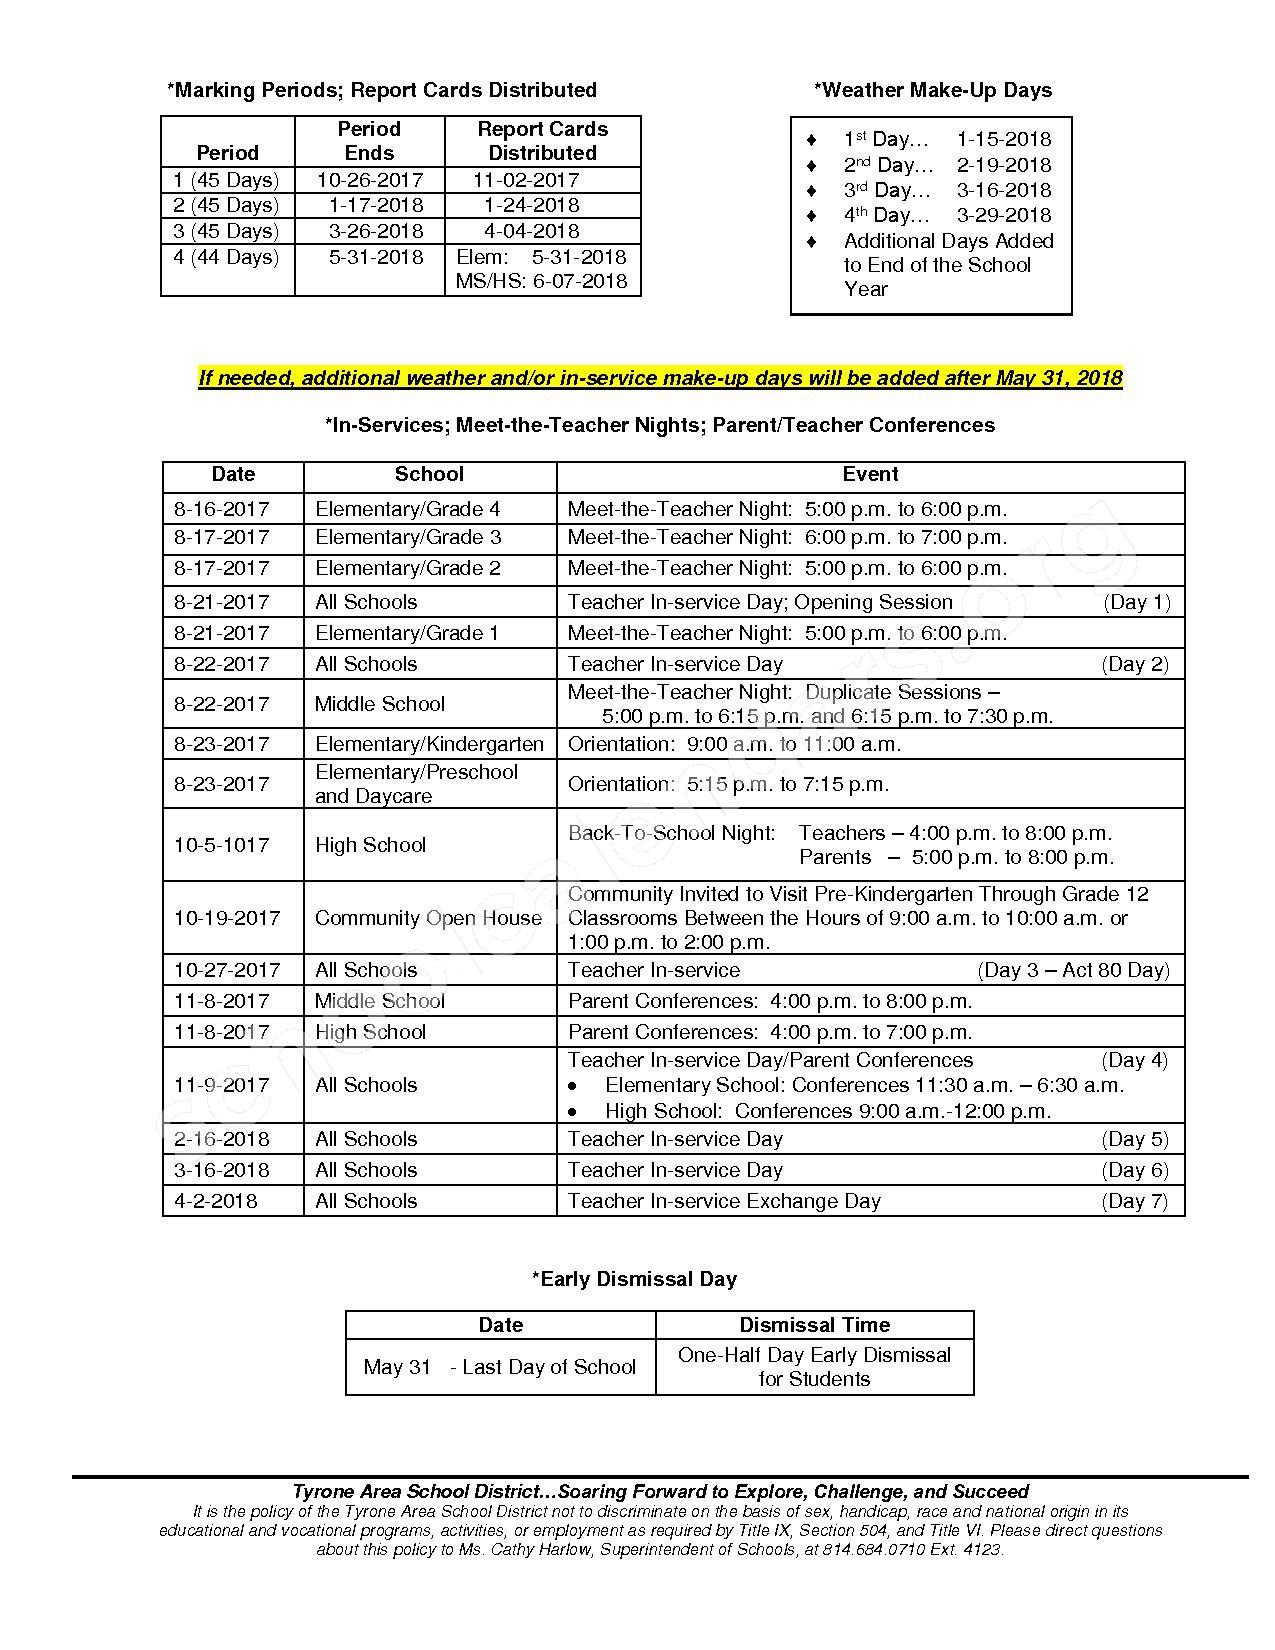 2017 - 2018 School Calendar – Tyrone Area School District – page 2